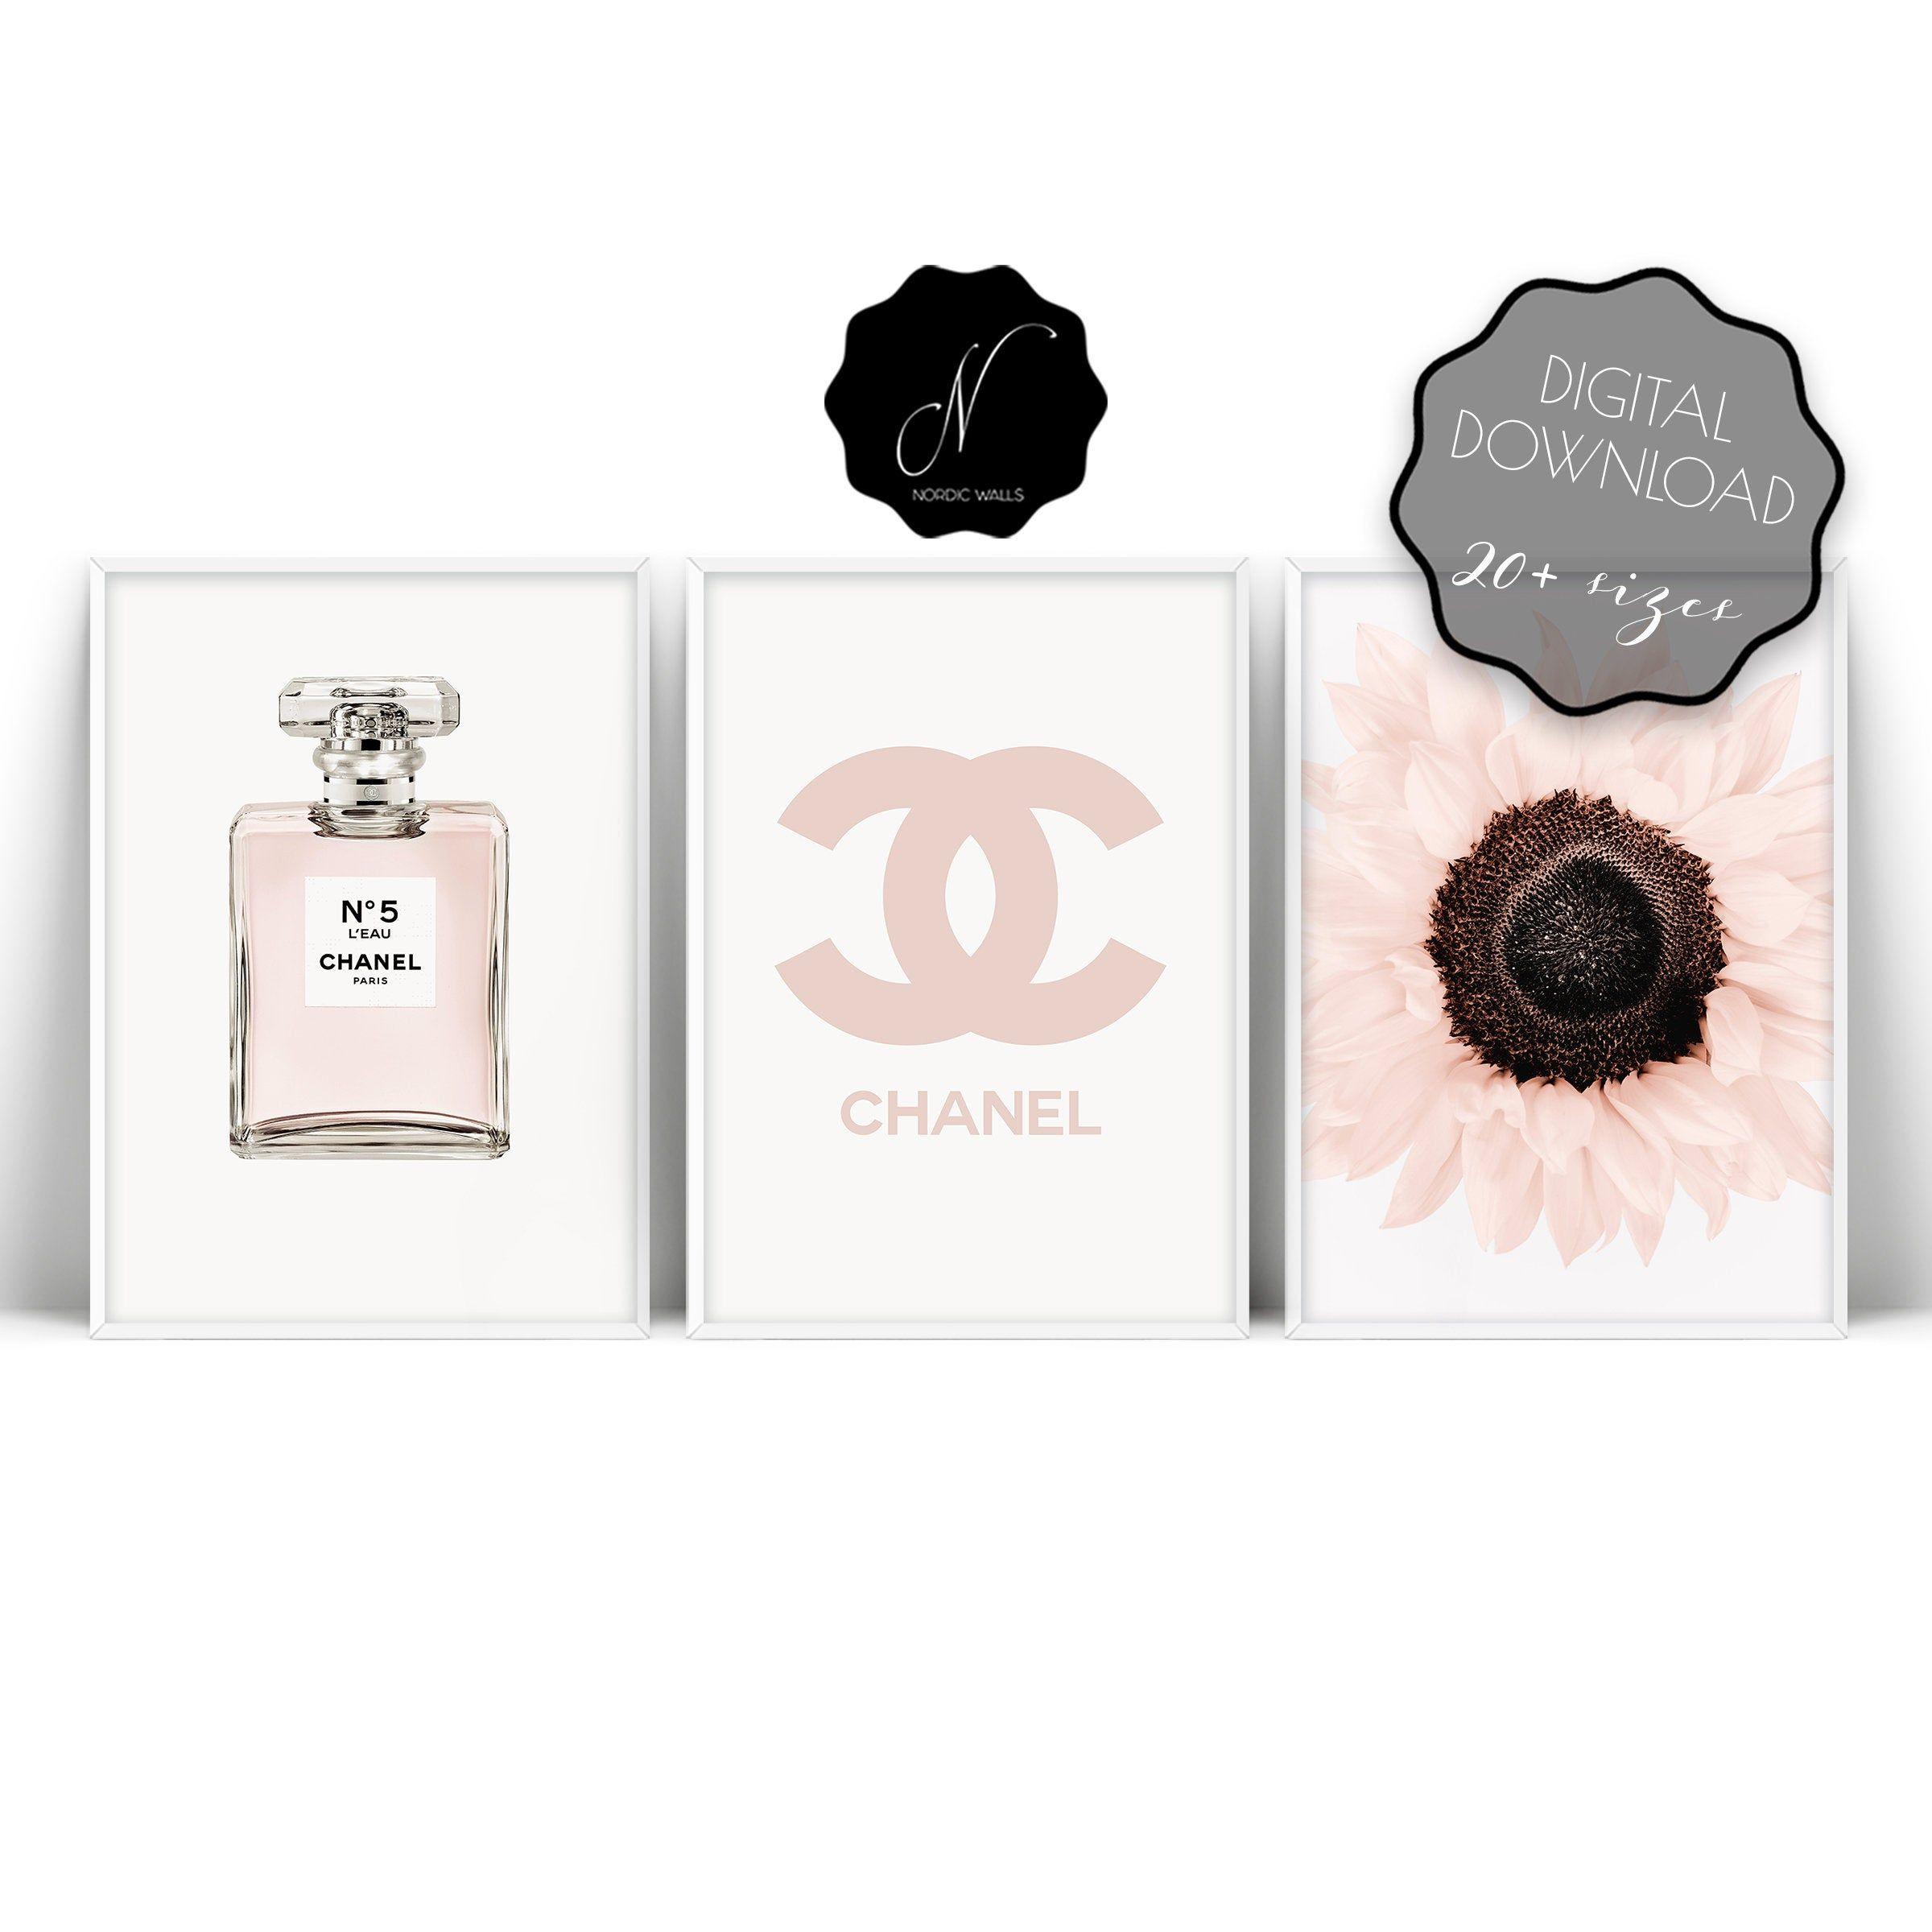 Coco Chanel Art Fashion Print Coco Chanel Wall Art Chanel No 5 Print Chanel Perfume Printable Wall Art Chanel Wal Chanel Wall Art Chanel Art Wall Art Sets